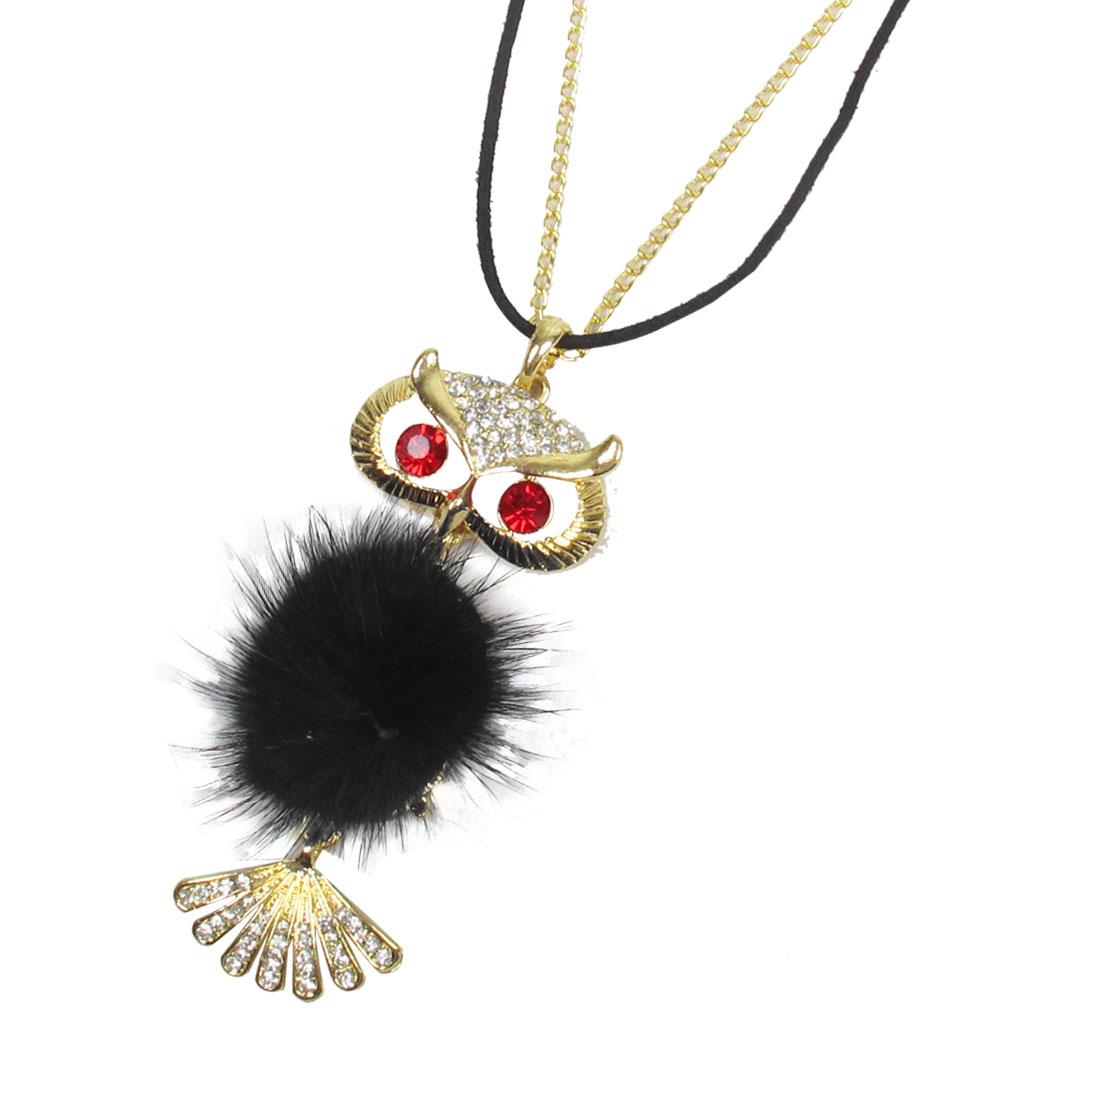 Shiny Rhinestone Decor Mixed Strings Owl Design Pendant Necklace for